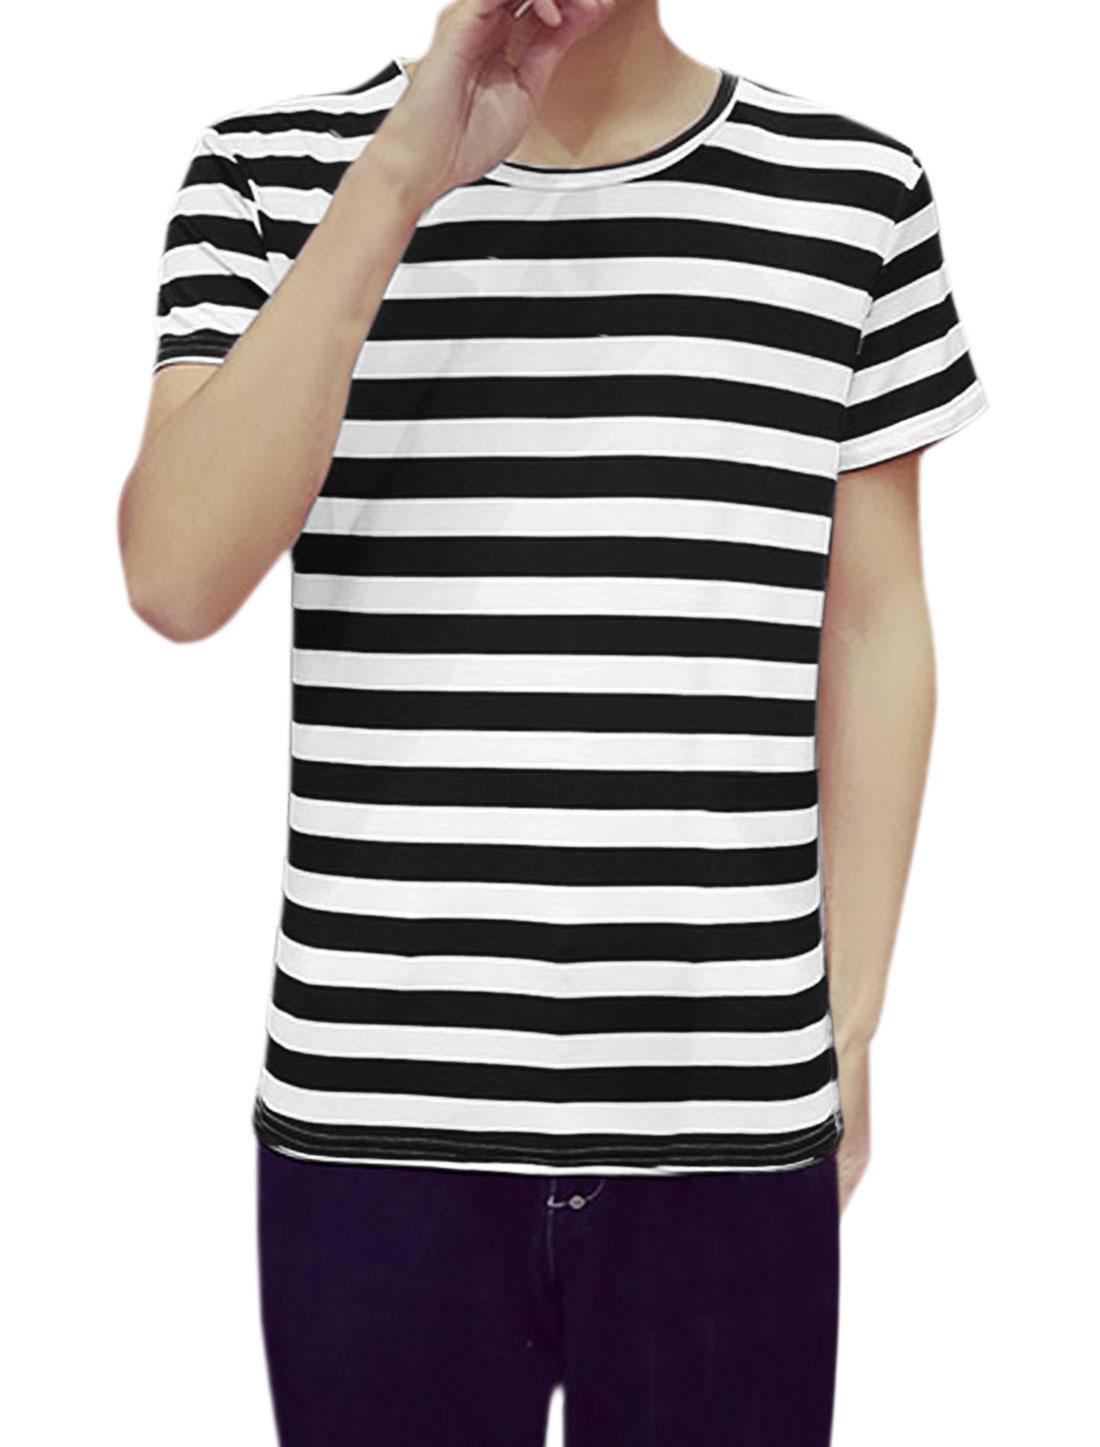 Men Crewneck Color Block Short Sleeve Striped T Shirt Black XXL US 50